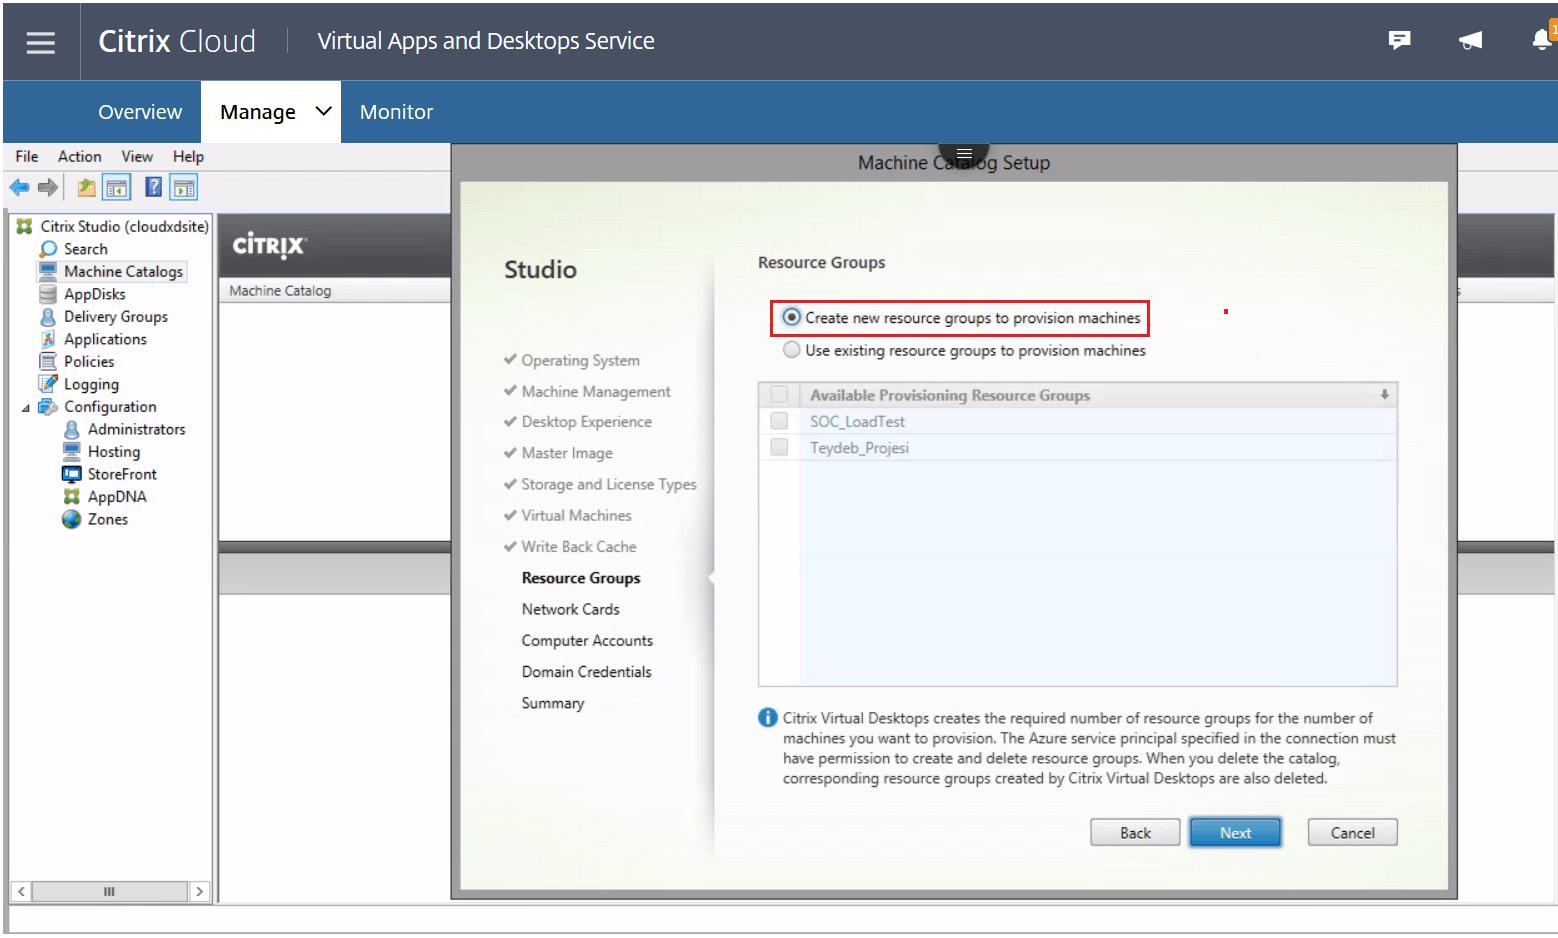 Citrix on Azure: Machine Creation Services & AzureDocs